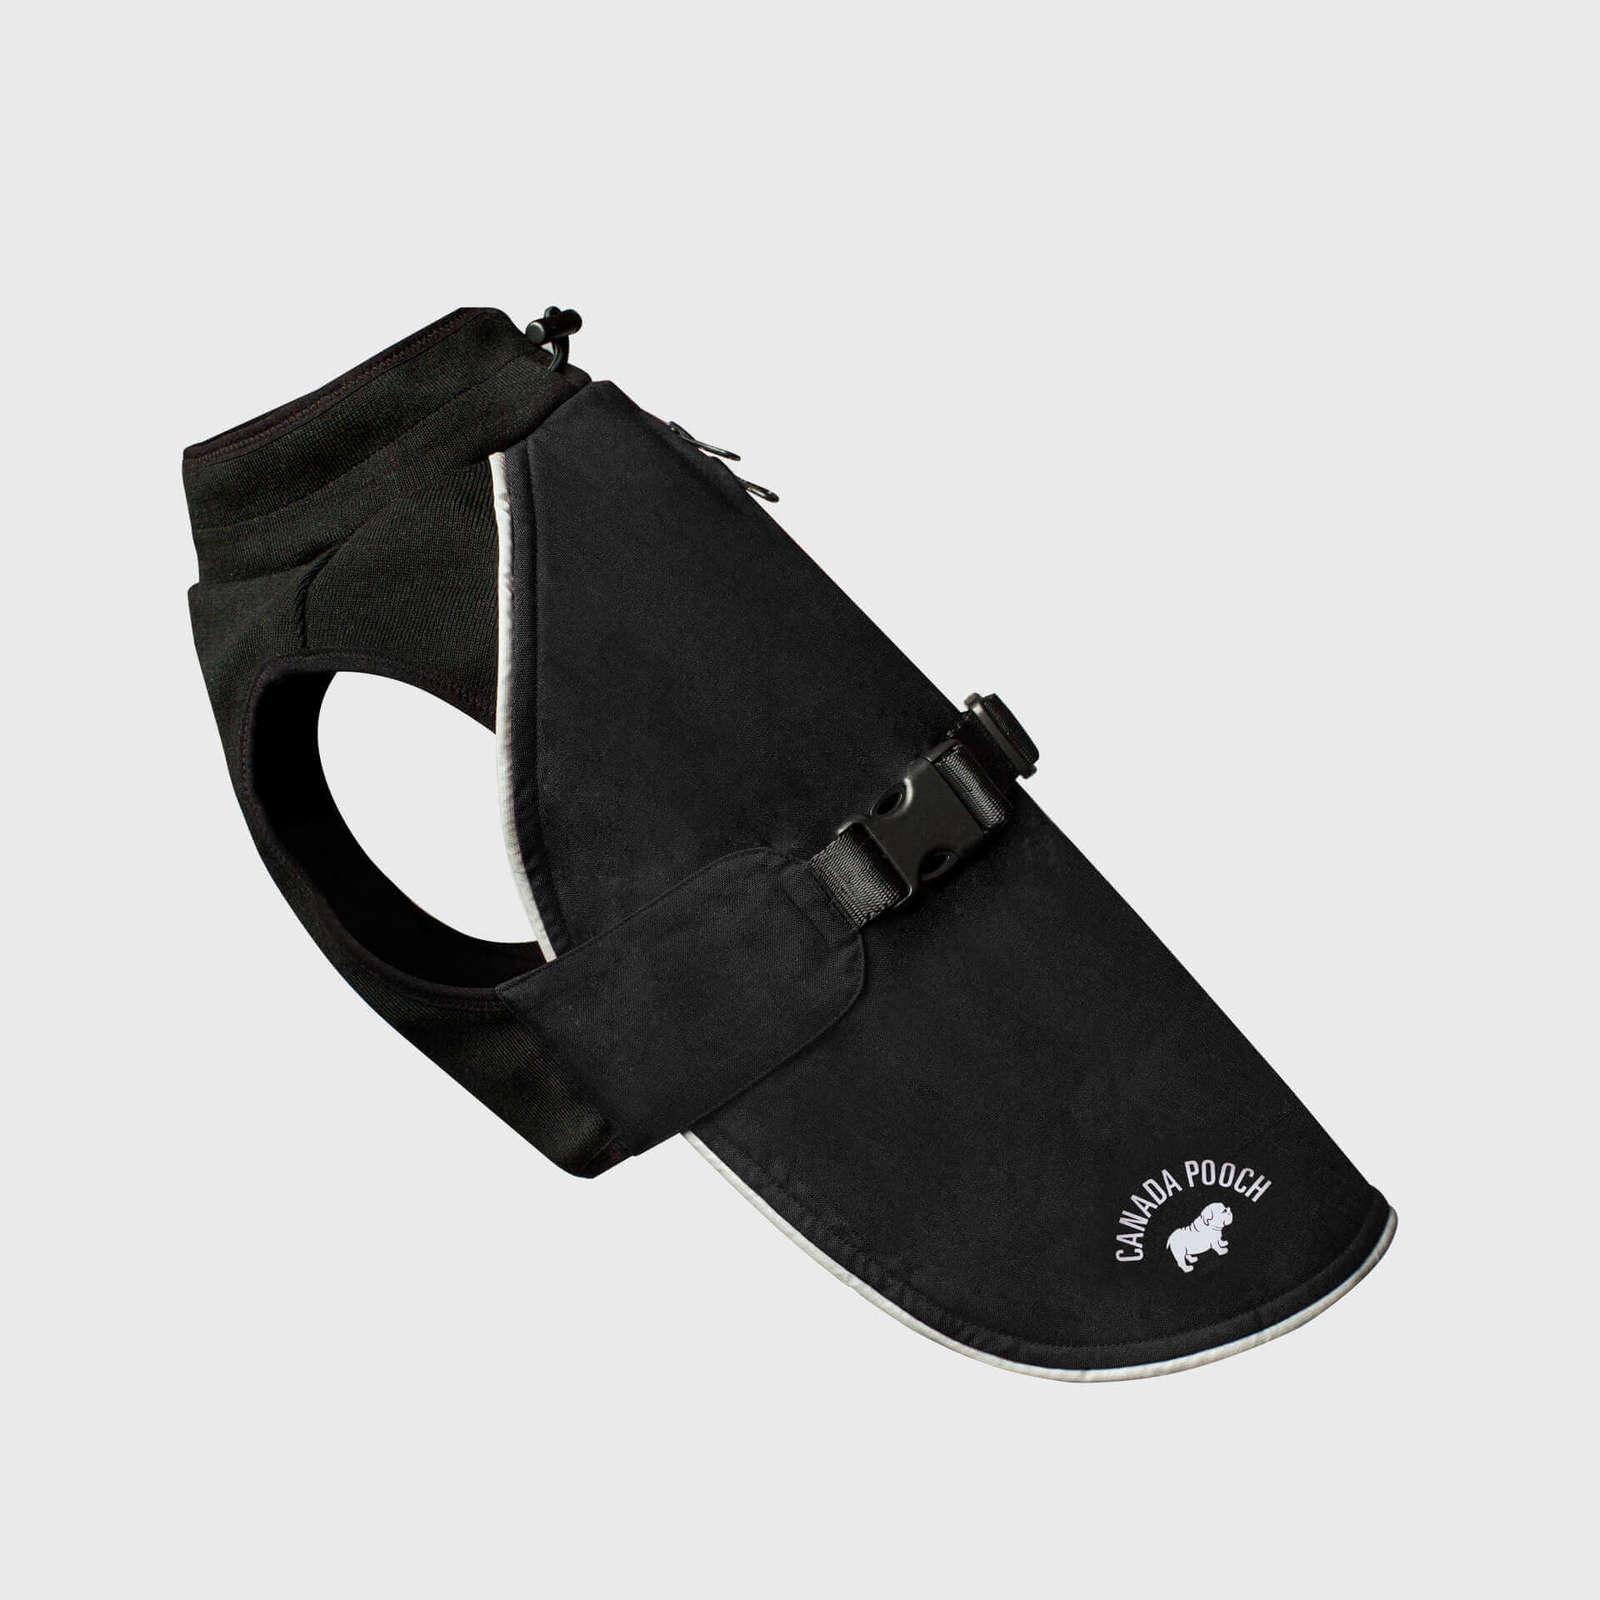 canada-pooch-expedition-dog-blanket-coat-black-off-figure-color_48